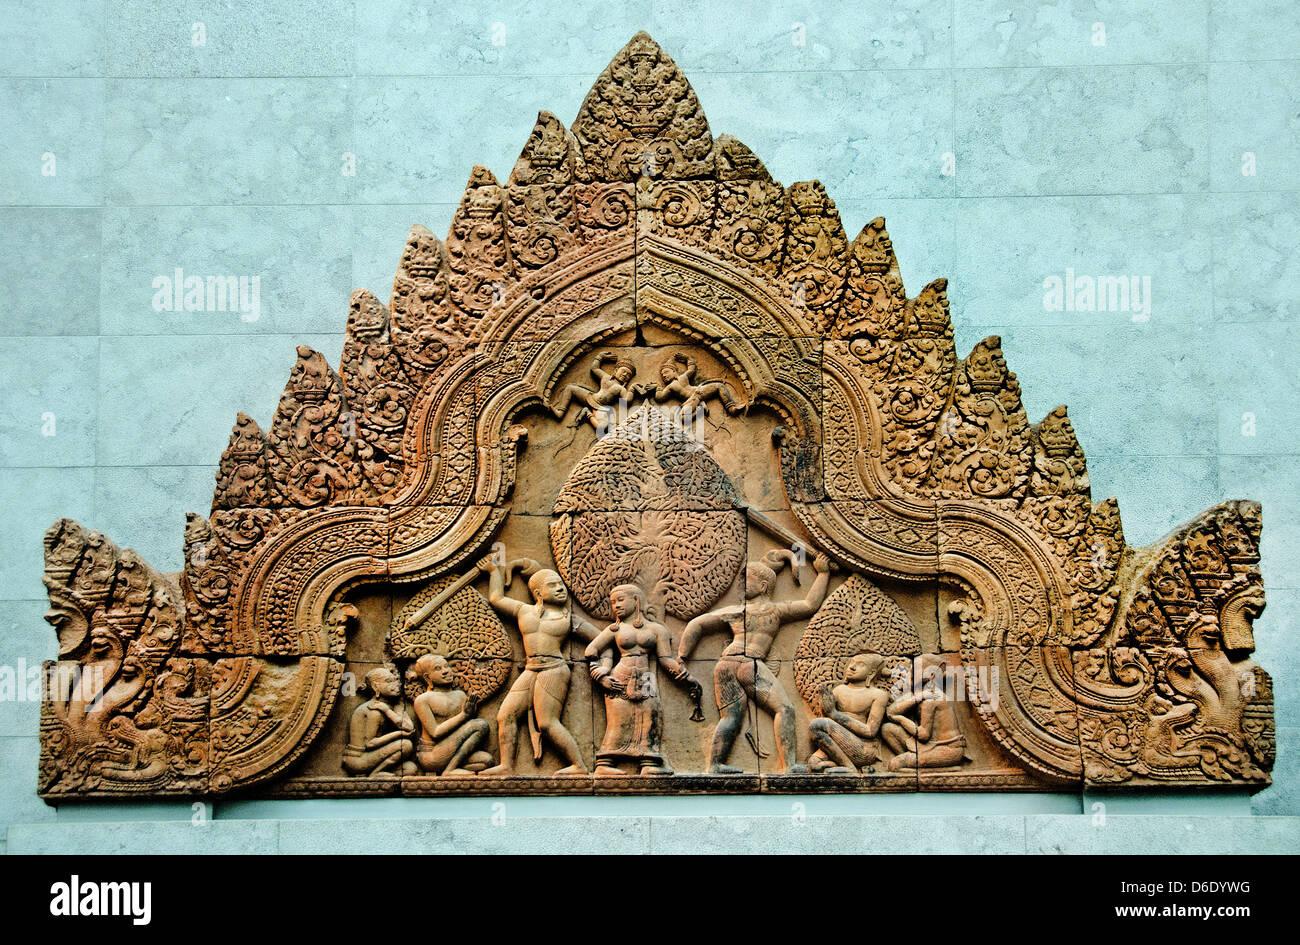 Fronton the Sunda and asura Upasunda disputing the apsara Tilattama. Cambodia Siem Reap province Banteay Srei 967 - Stock Image